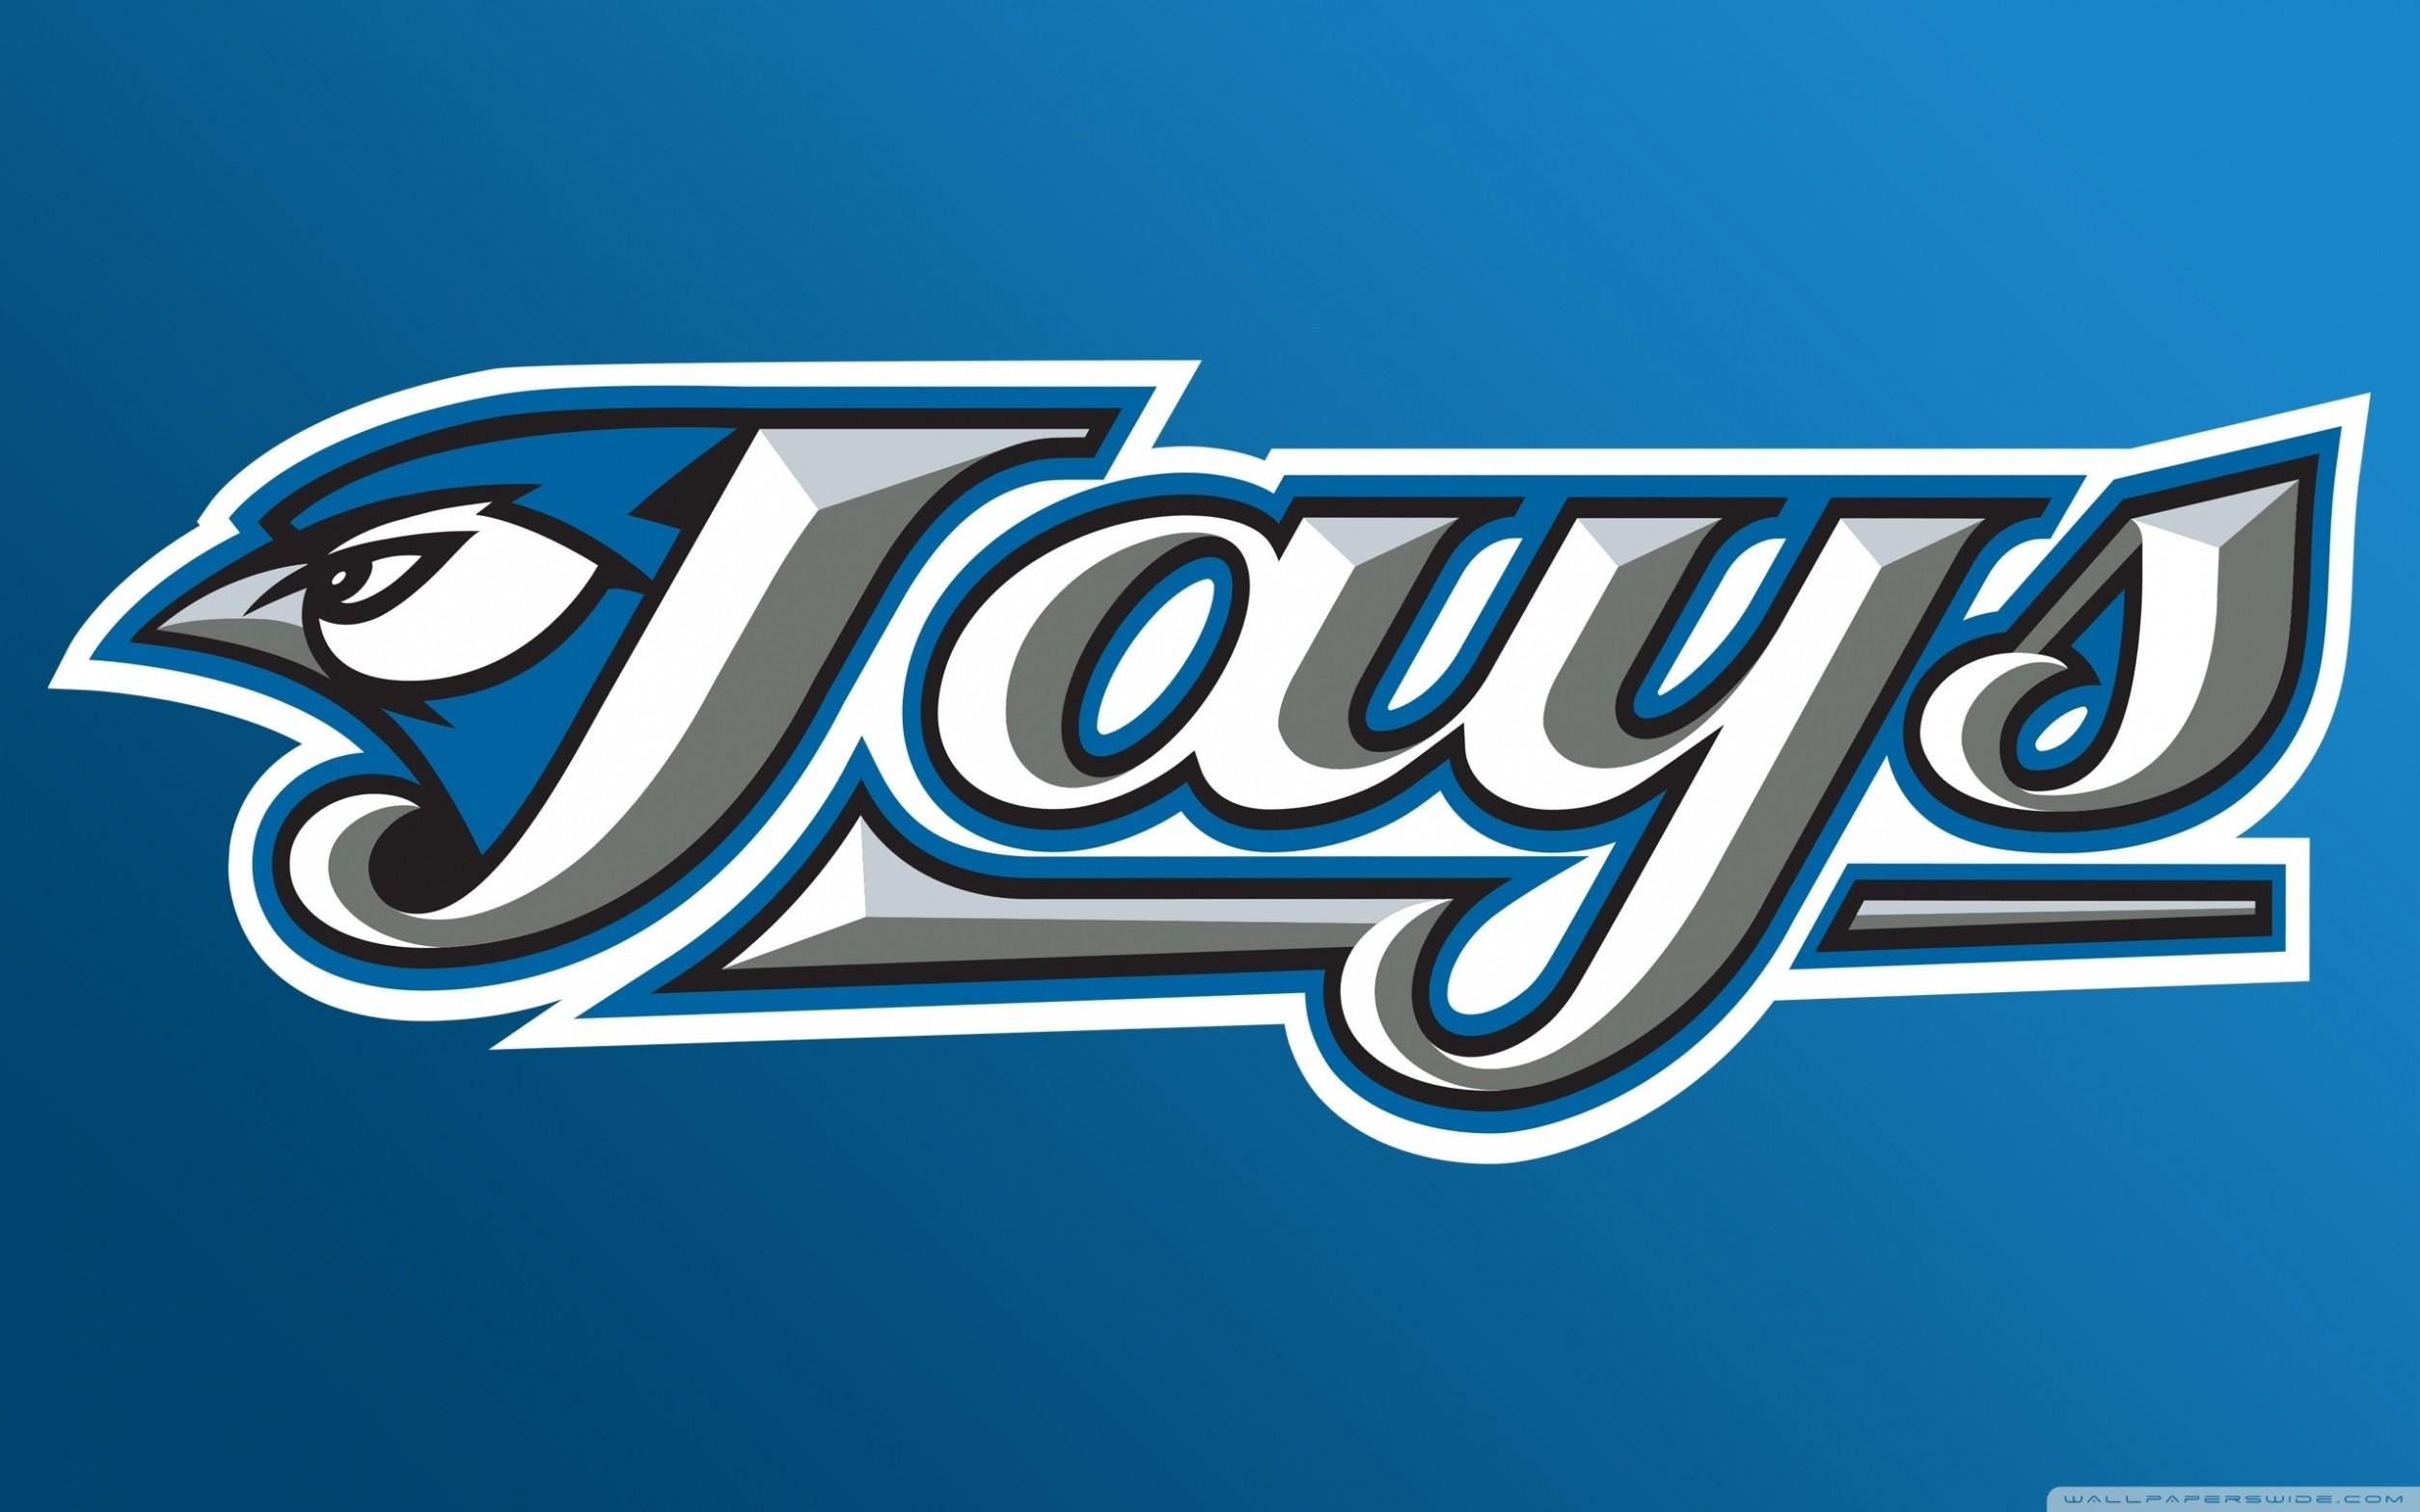 2509x1568 toronto blue jays logo hd desktop wallpaper for toronto blue jays wallpaper